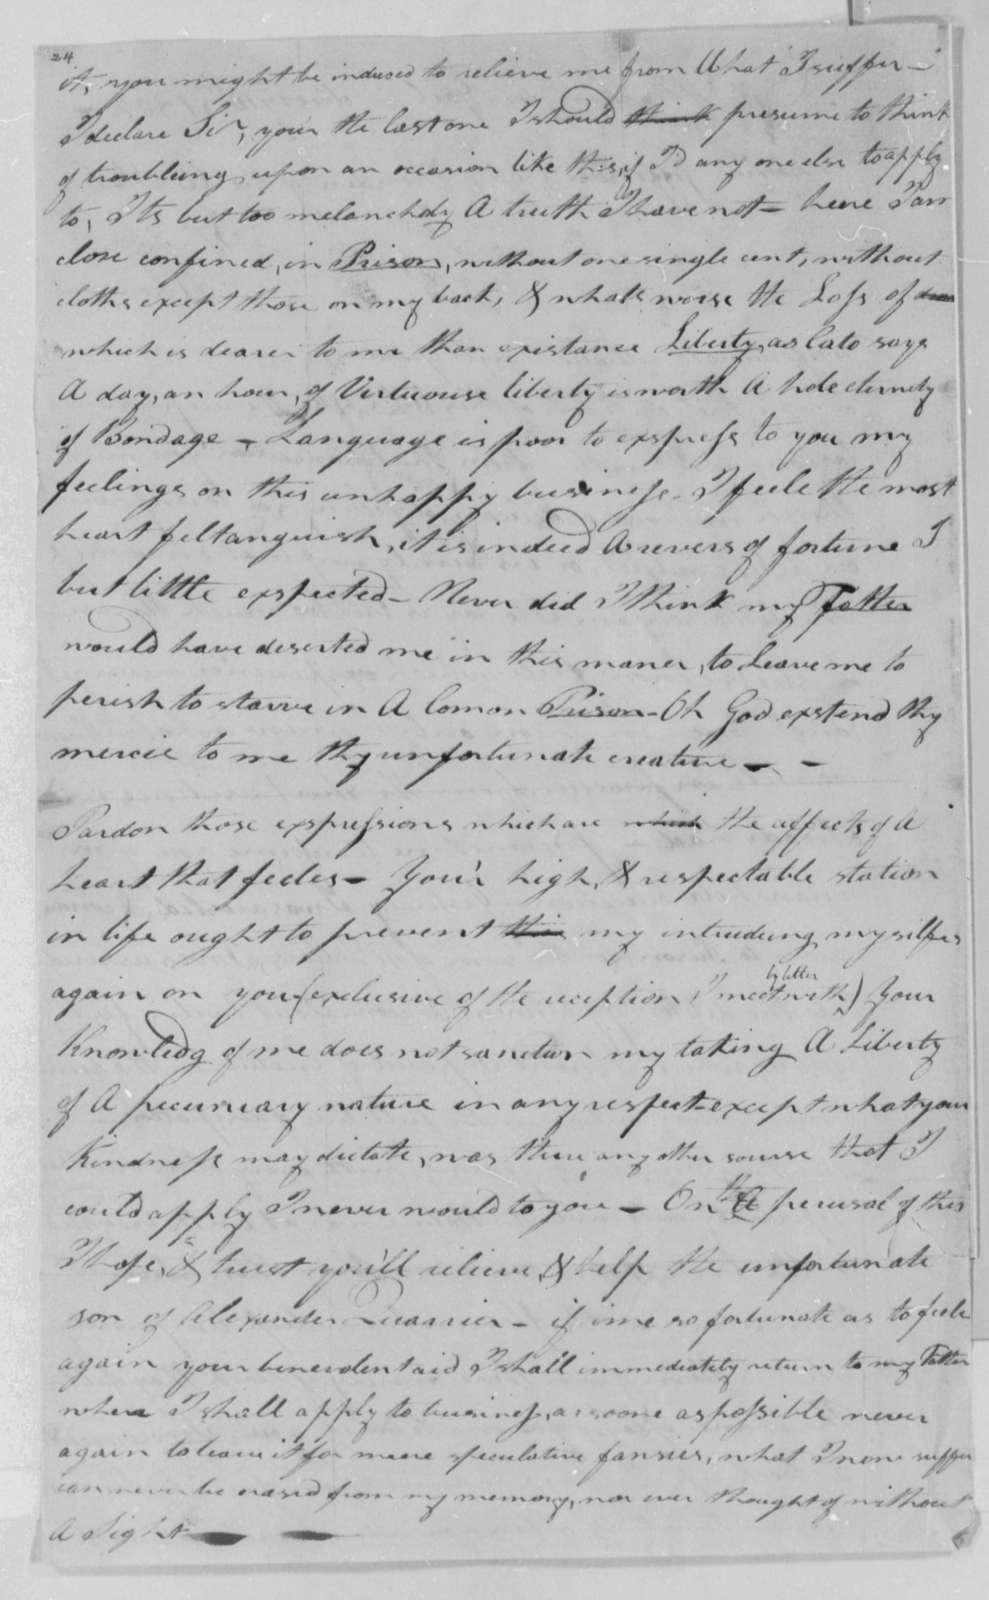 Samuel Quarrier to Thomas Jefferson, February 10, 1802